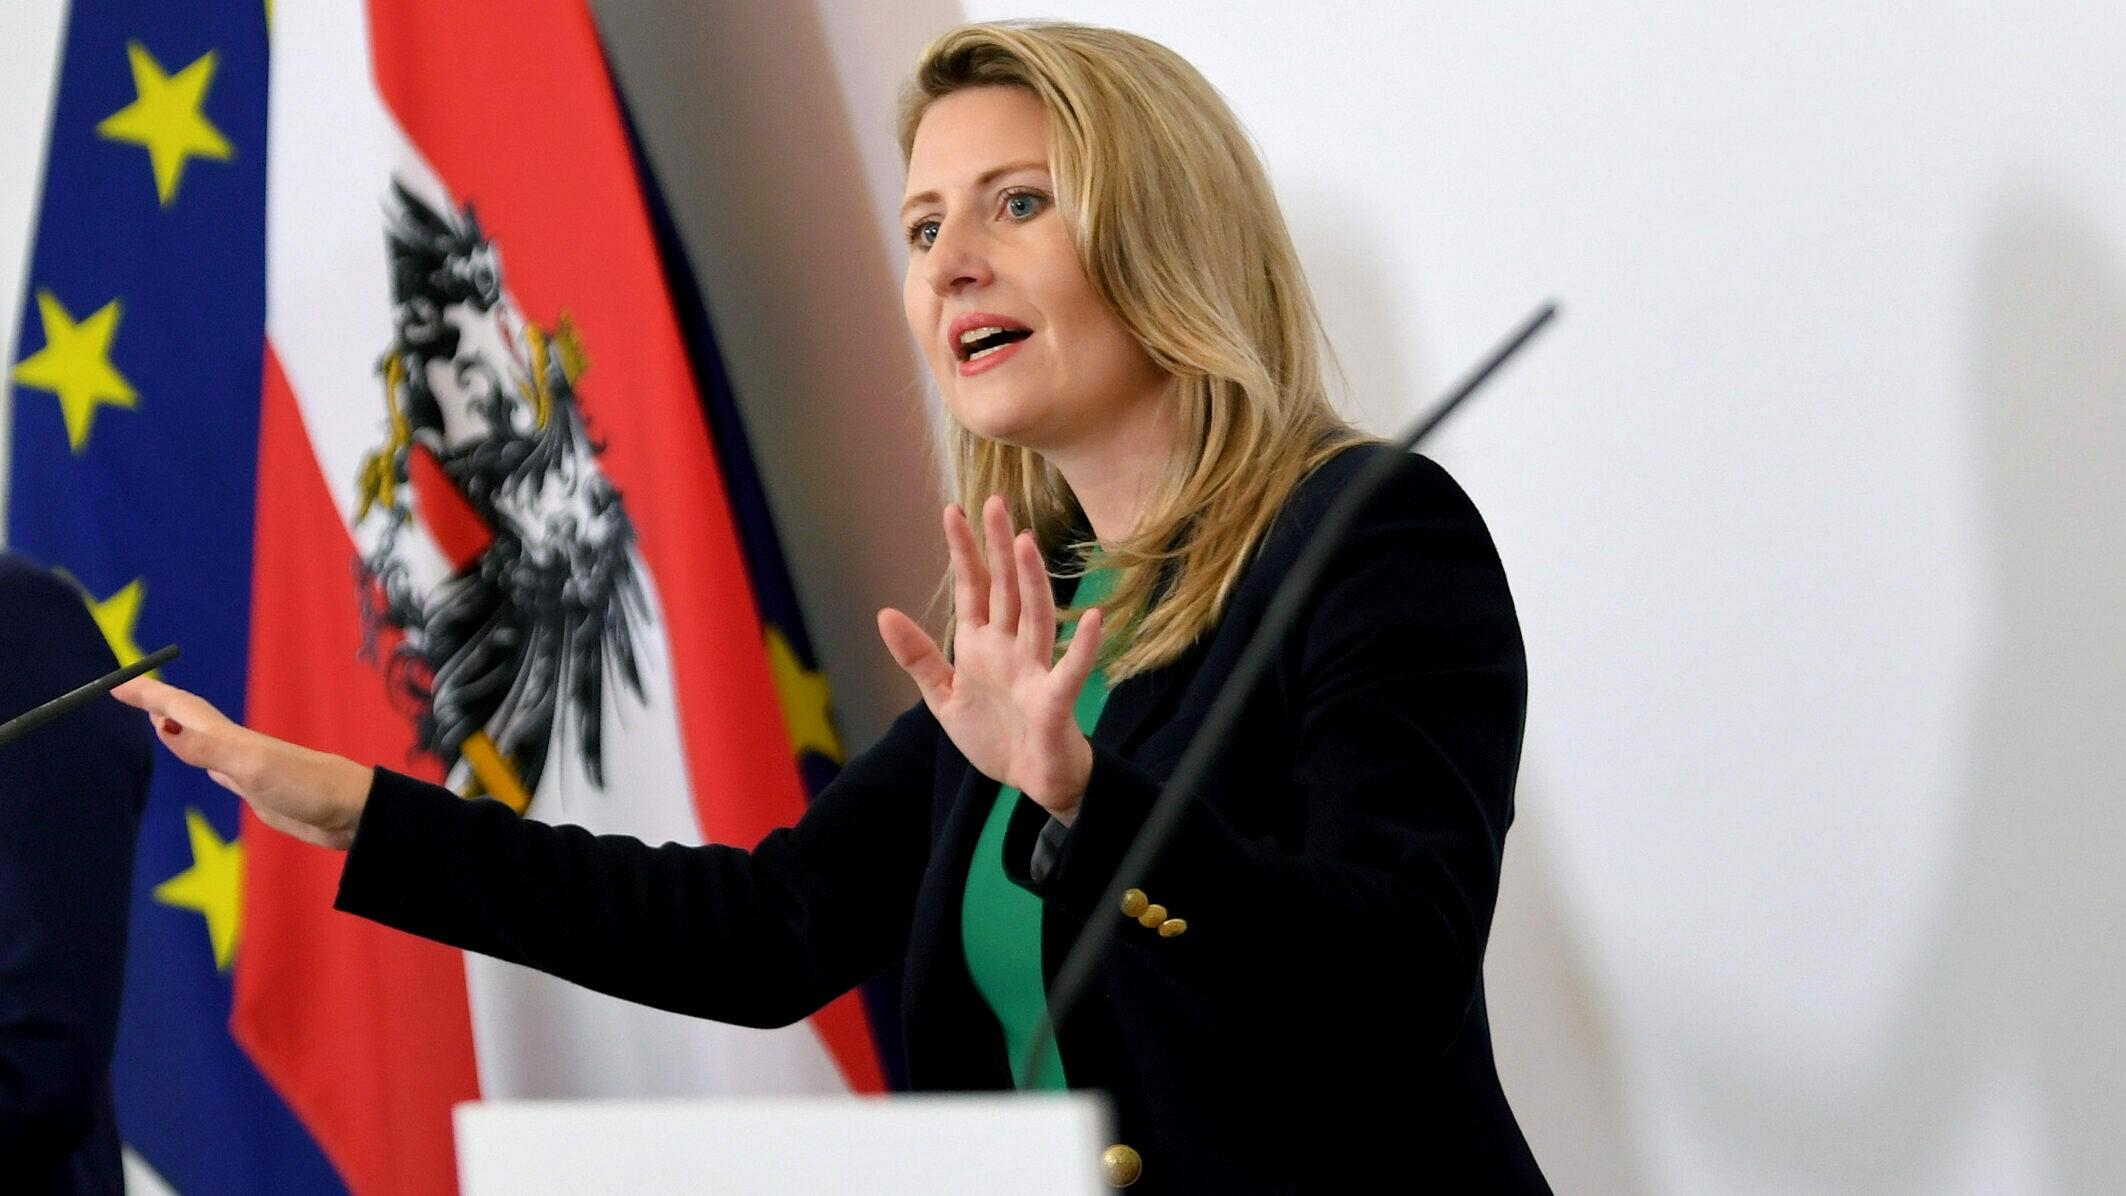 Dokumentationsstelle nimmt Extremismus ins Visier | krone.at